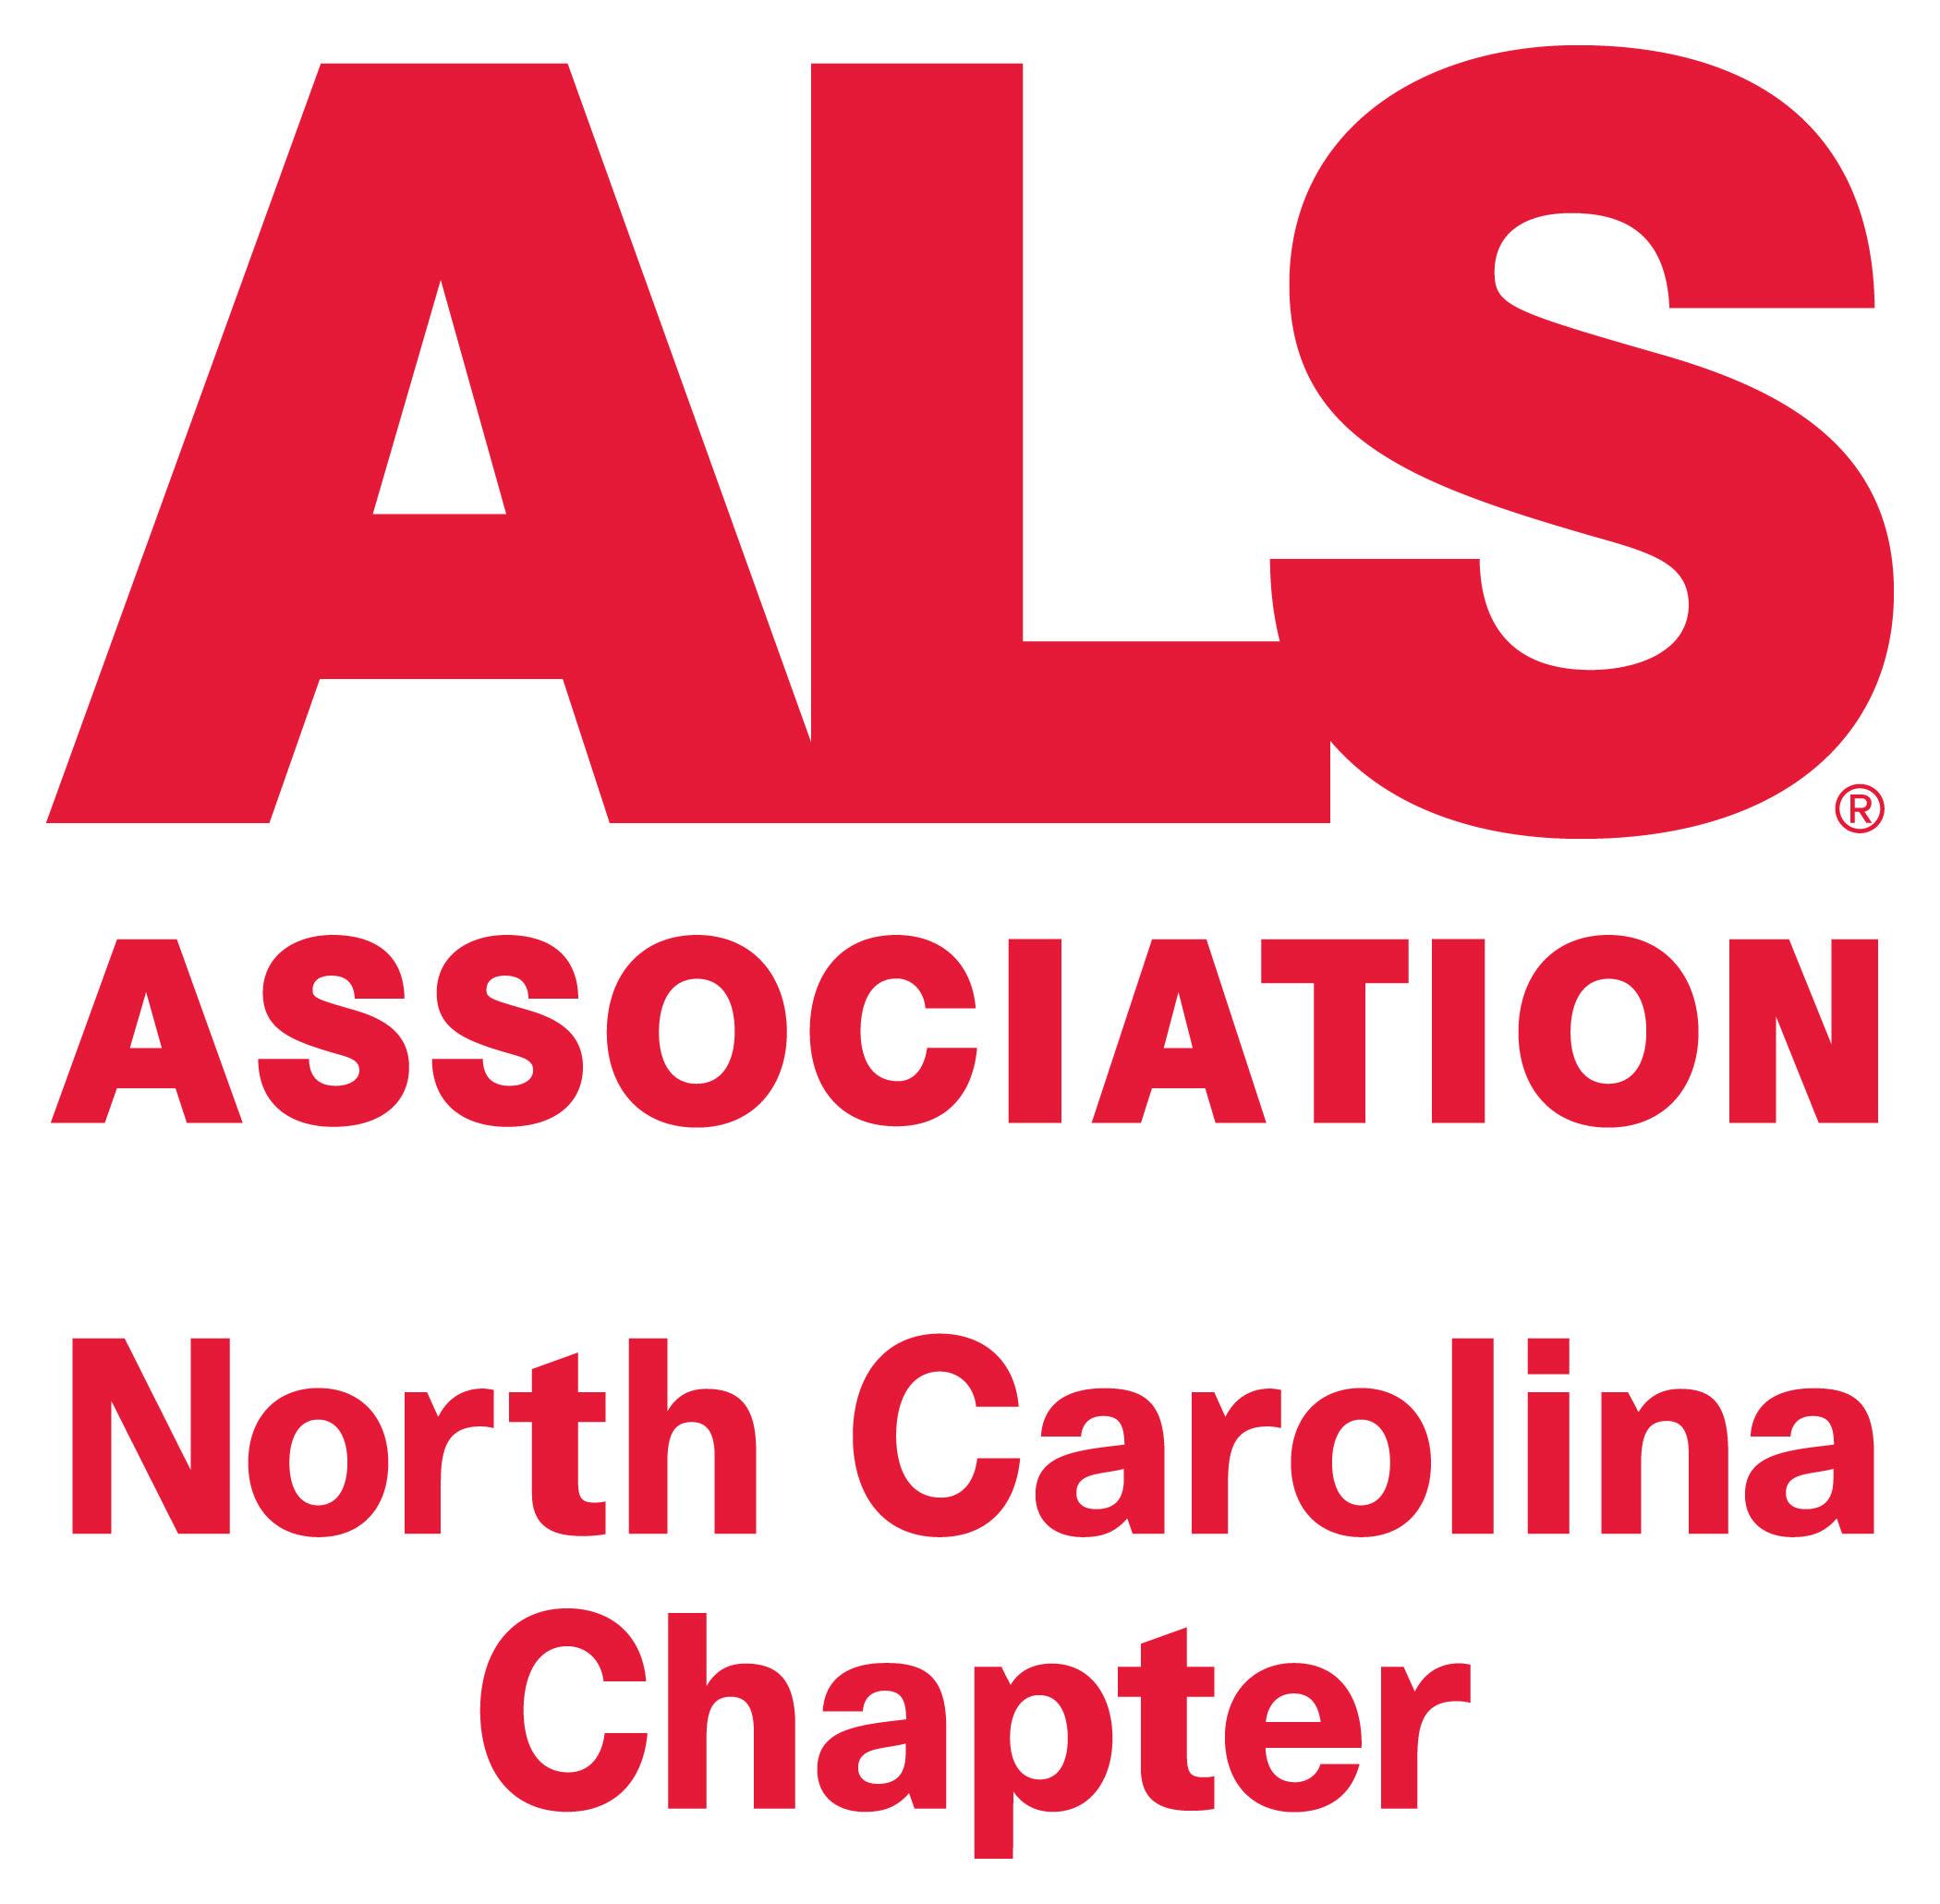 The ALS Association North Carolina Chapter